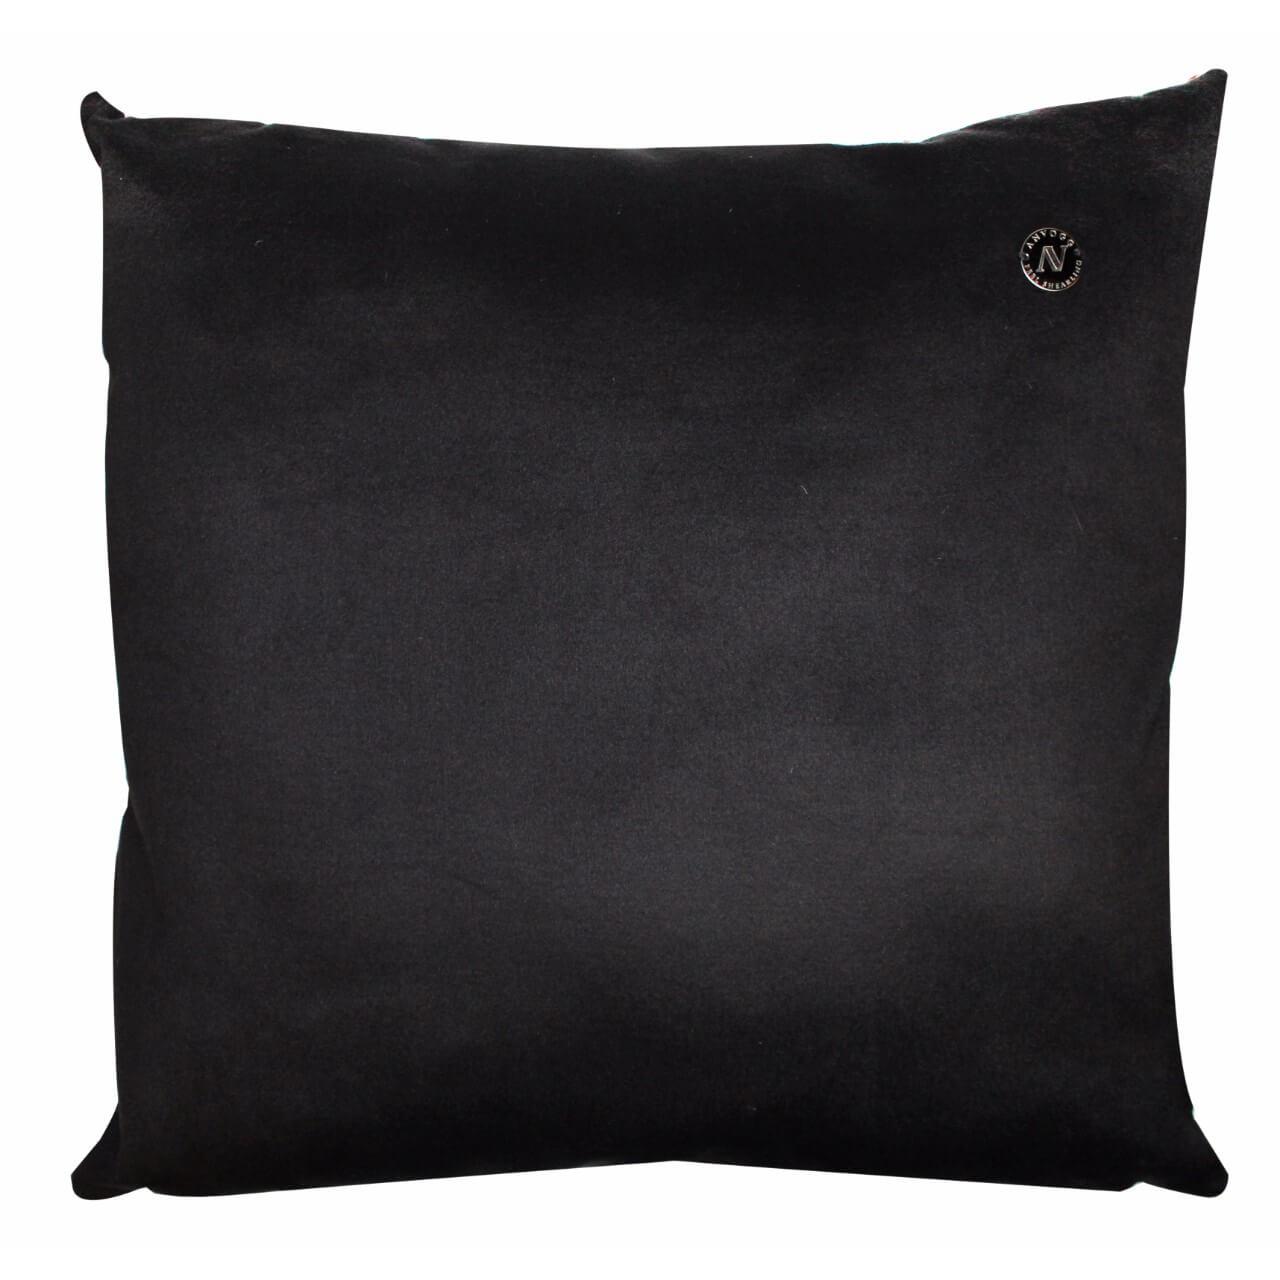 Cavallino Pillow-50x50cm-(RENK_Brown Zebra)- (İSİM_The Brown Squa)-(CPZEB10175095050) arka - ANVOGG FEEL SHEARLING | ANVOGG